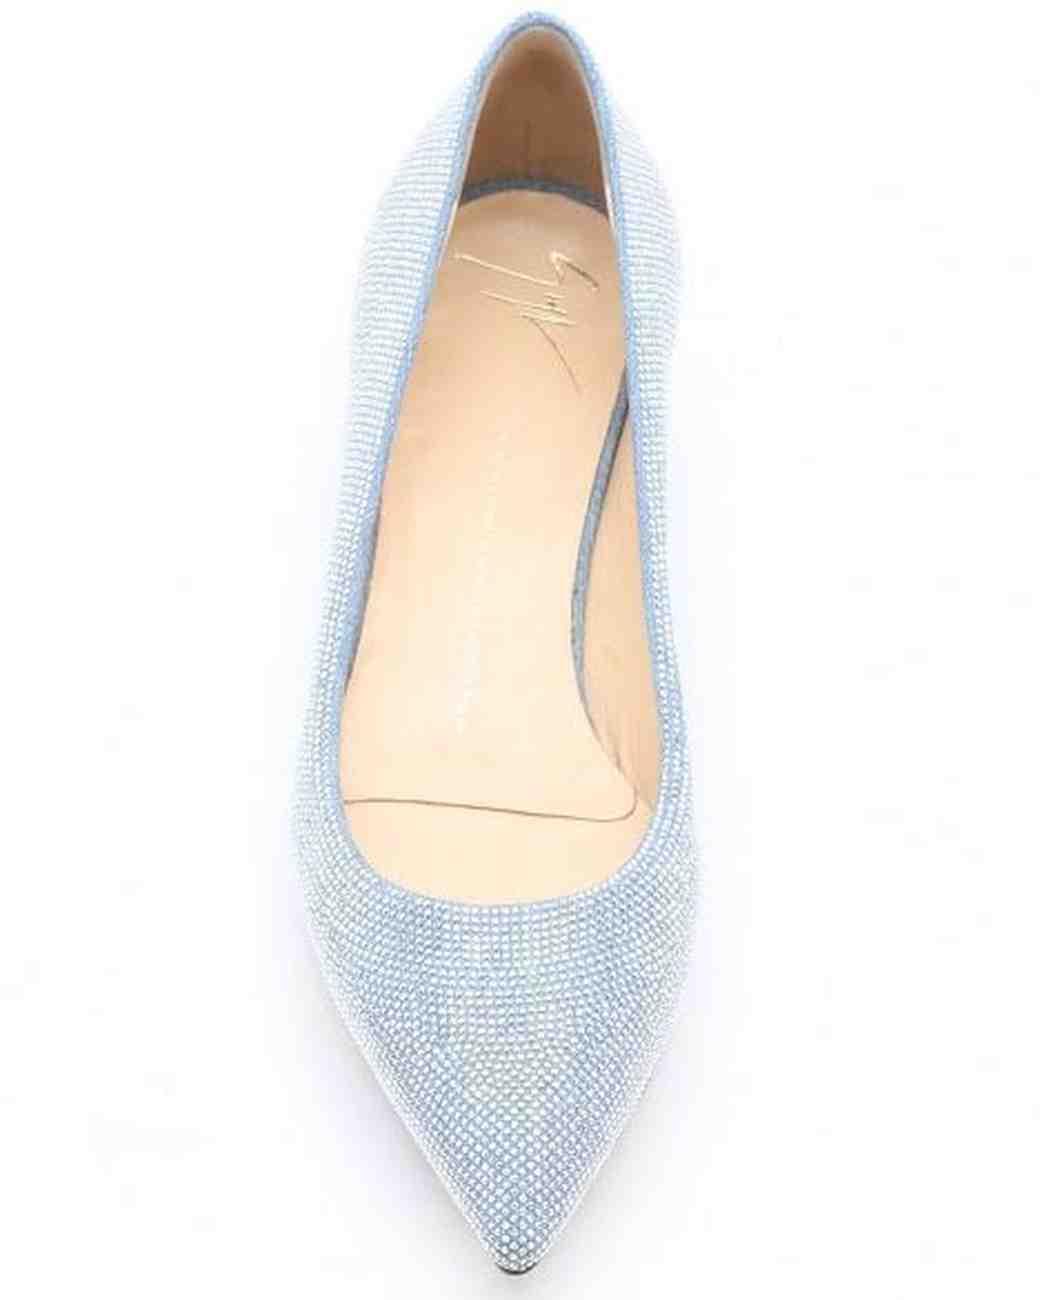 wedding-flats-blue-fly-studded-light-blue-0216.jpg